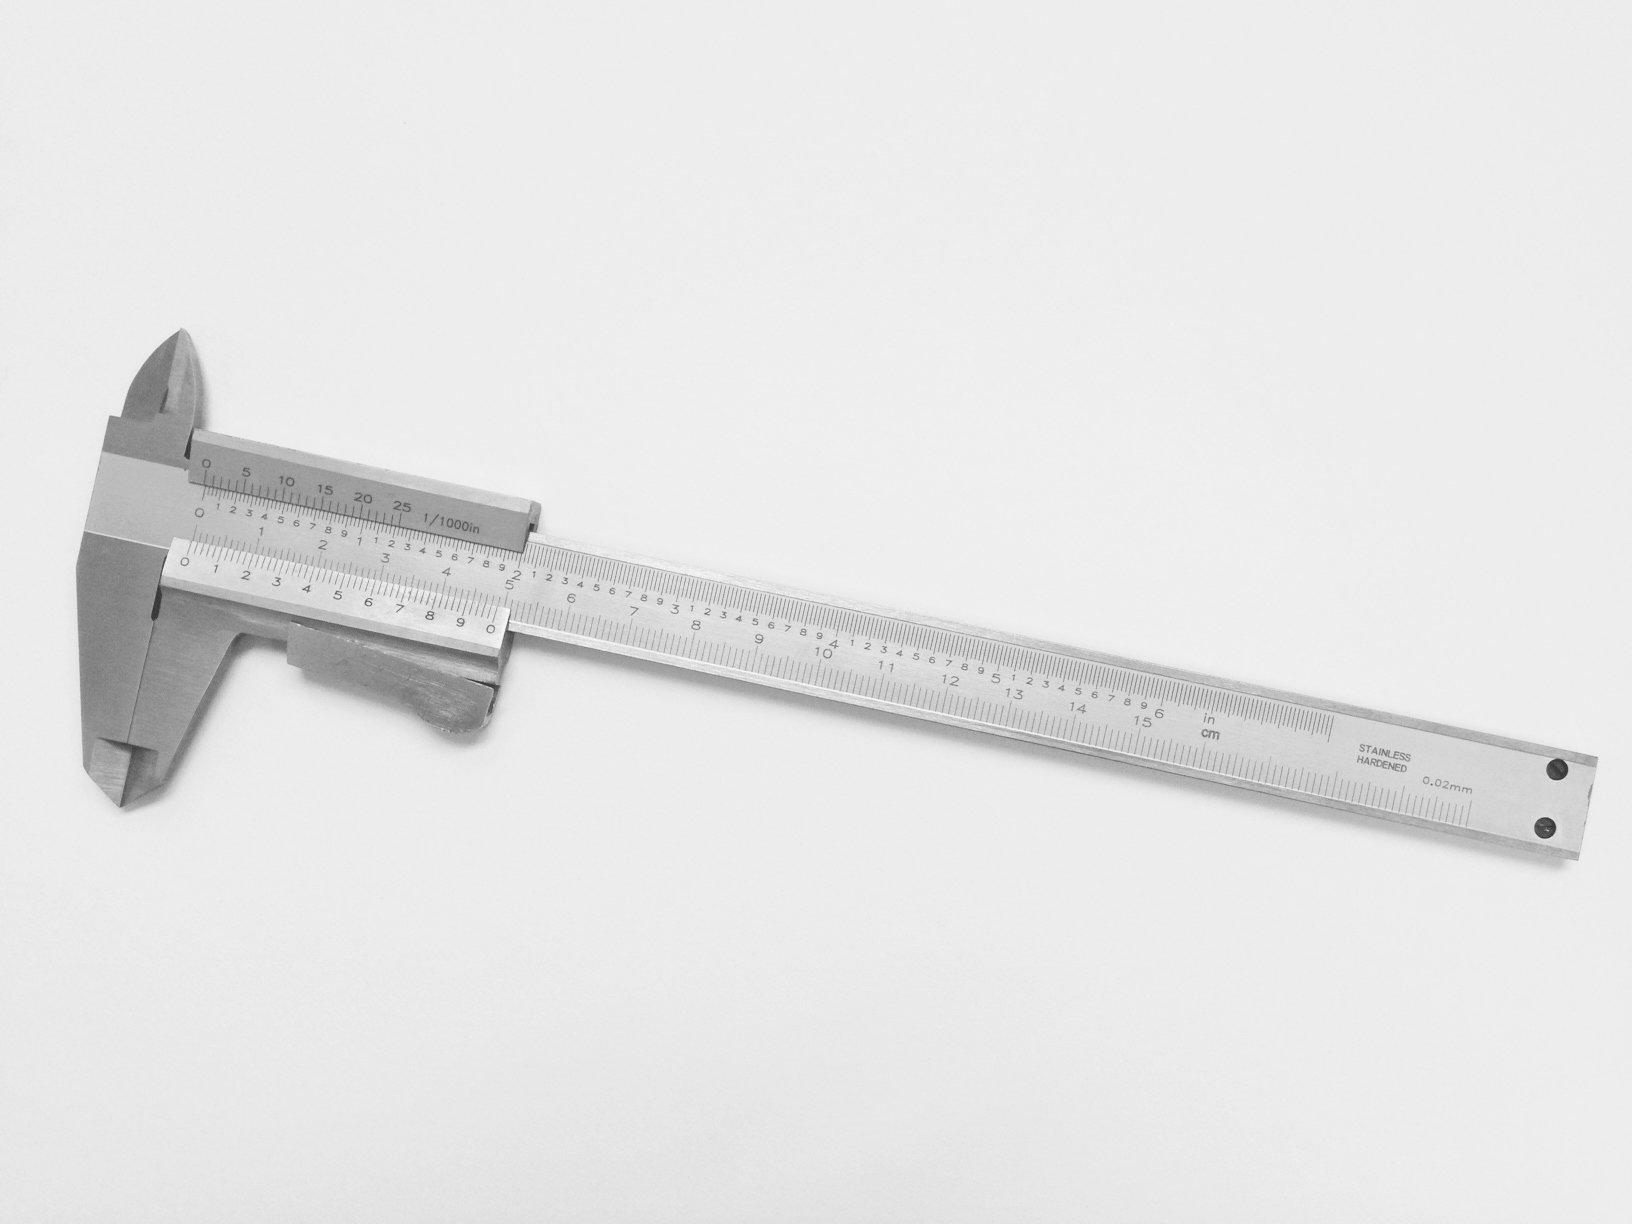 HHIP 4100-0004 Thumb Lock Vernier Caliper, 6''/150 mm by HHIP (Image #1)